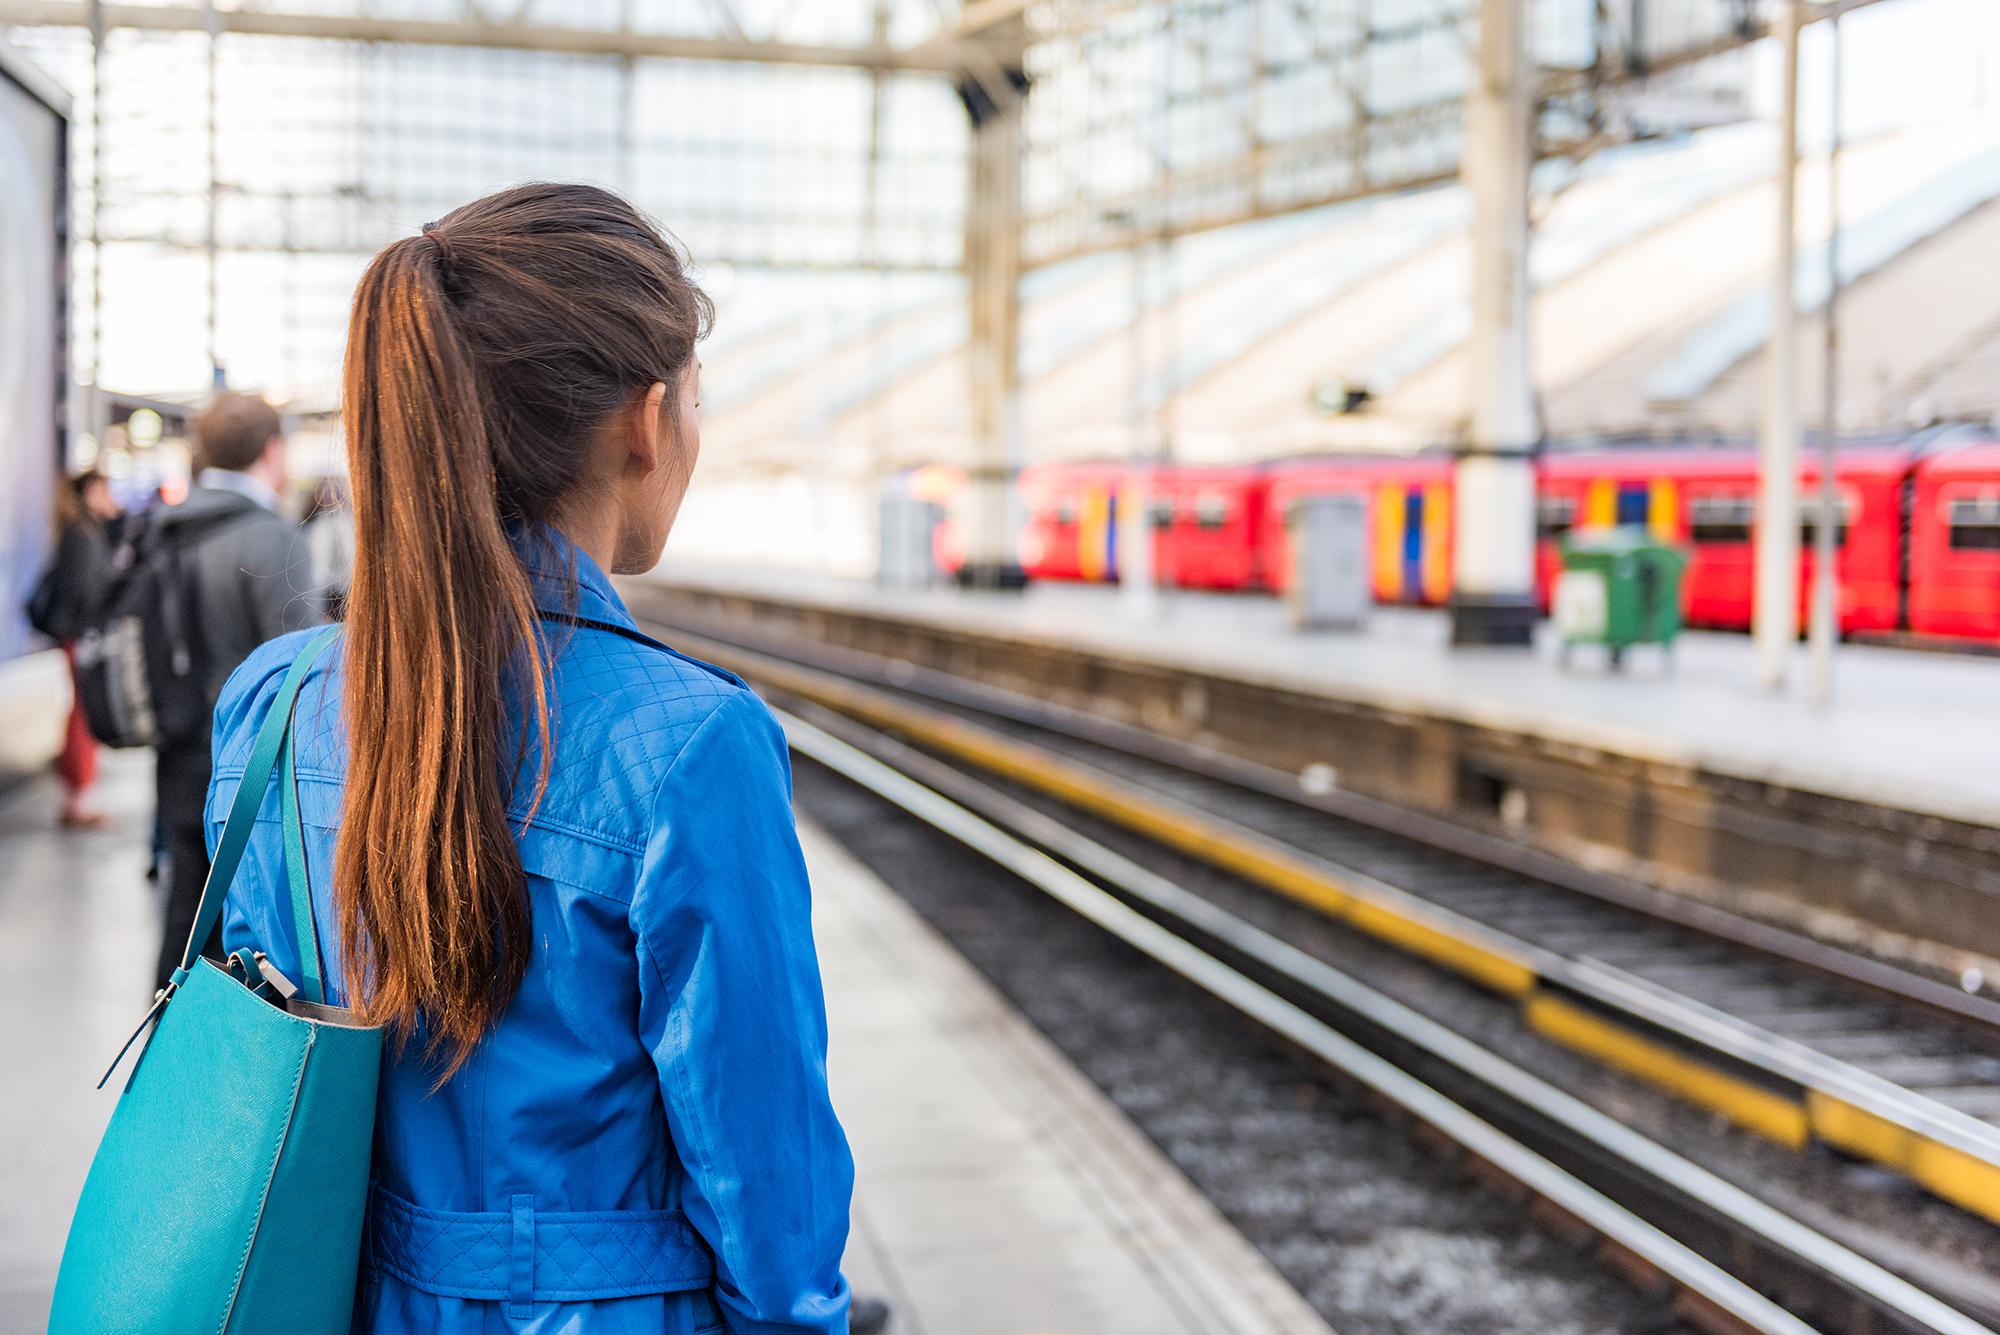 Woman waiting for train. (Image: Shutterstock)